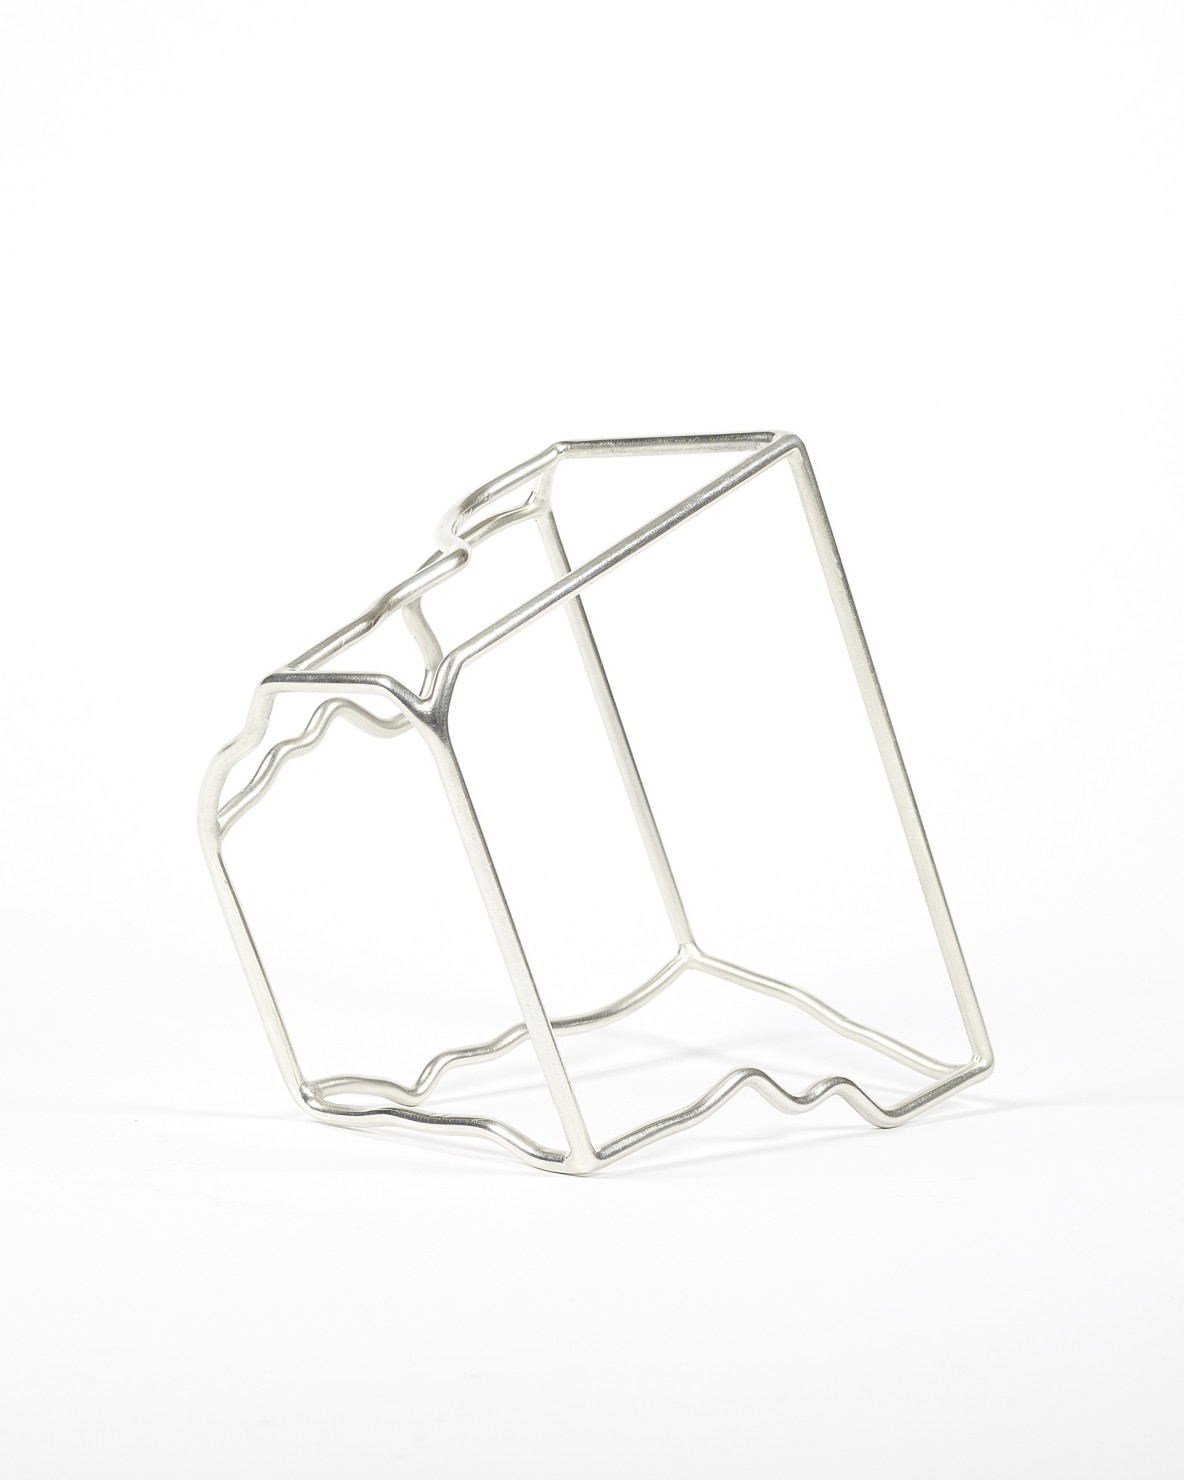 Will Nash  Fragment, 2018